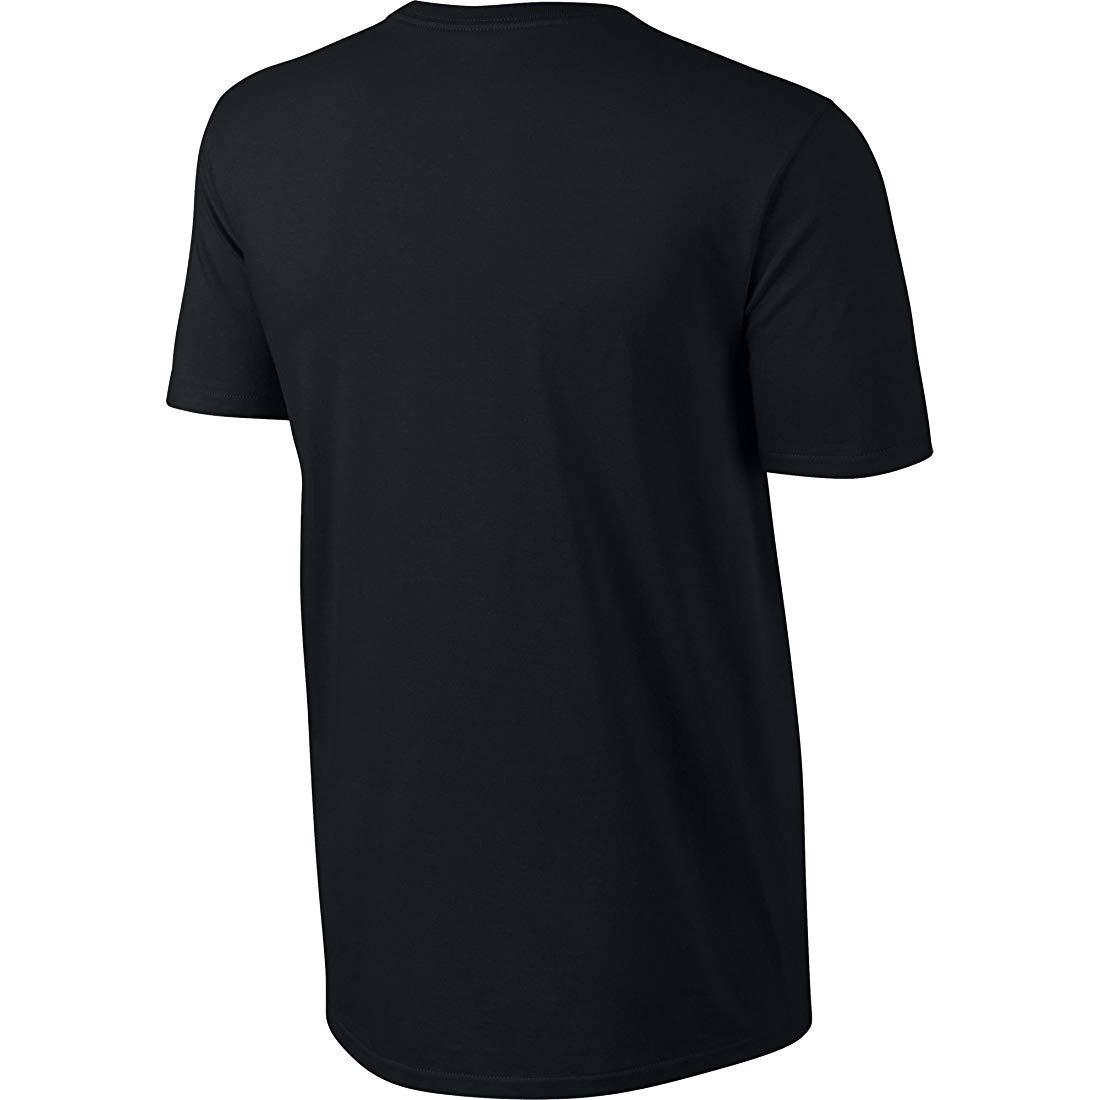 d4b8c8f17c Camiseta Deportiva Nike Para Hombres Just Do It Swoosh